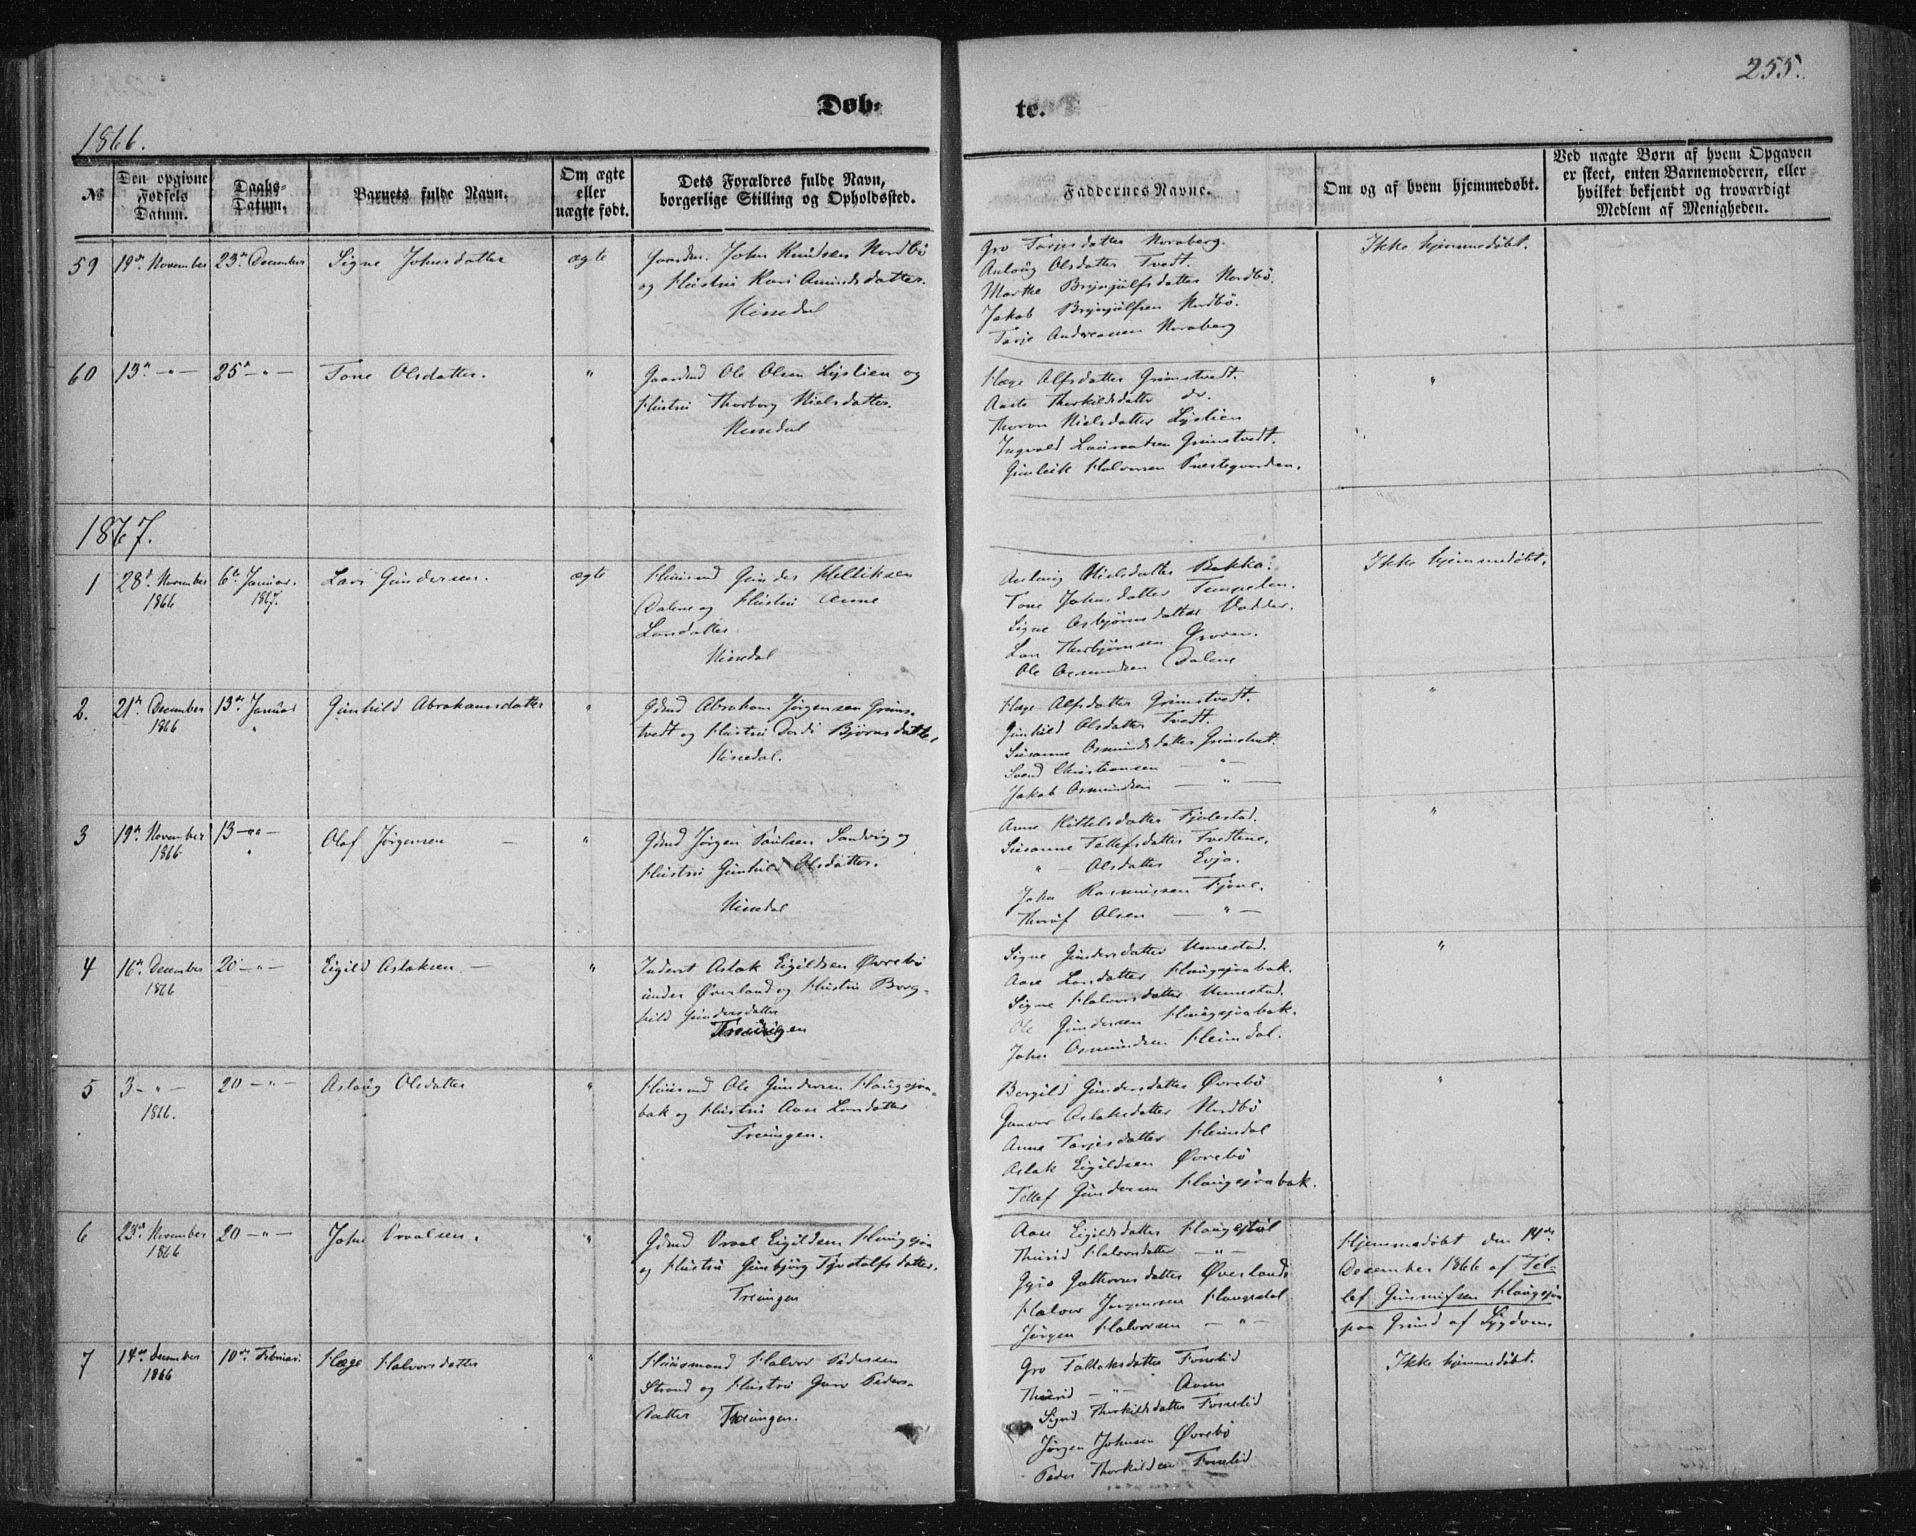 SAKO, Nissedal kirkebøker, F/Fa/L0003: Ministerialbok nr. I 3, 1846-1870, s. 254-255